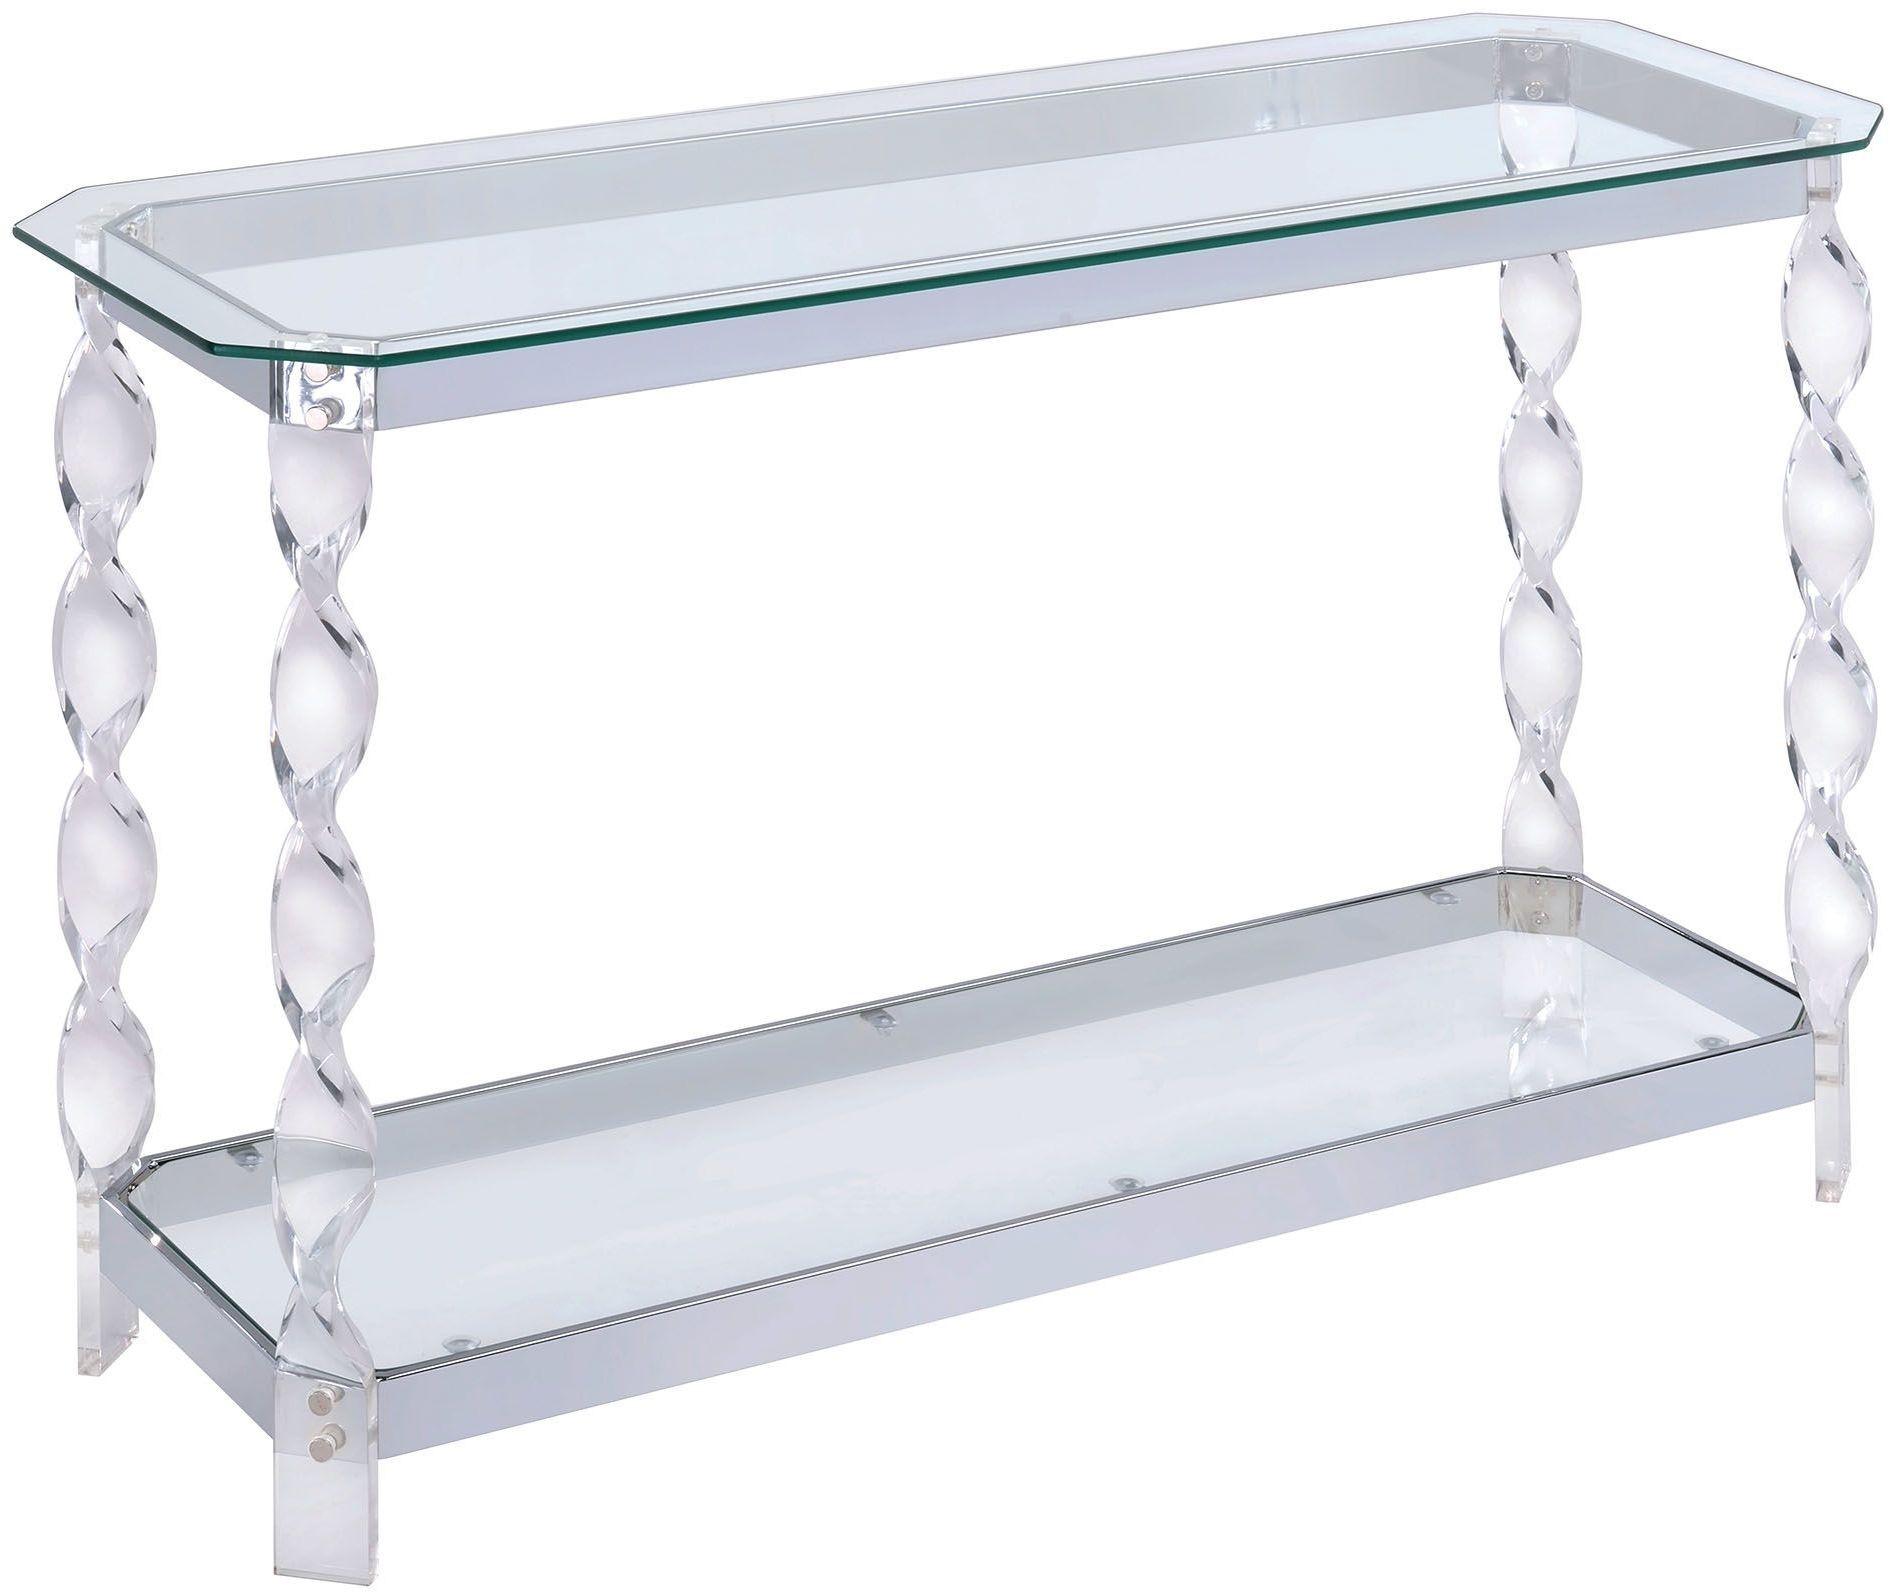 vogue chrome sofa table ikea friheten bed instructions mallow cm4357s furniture of america